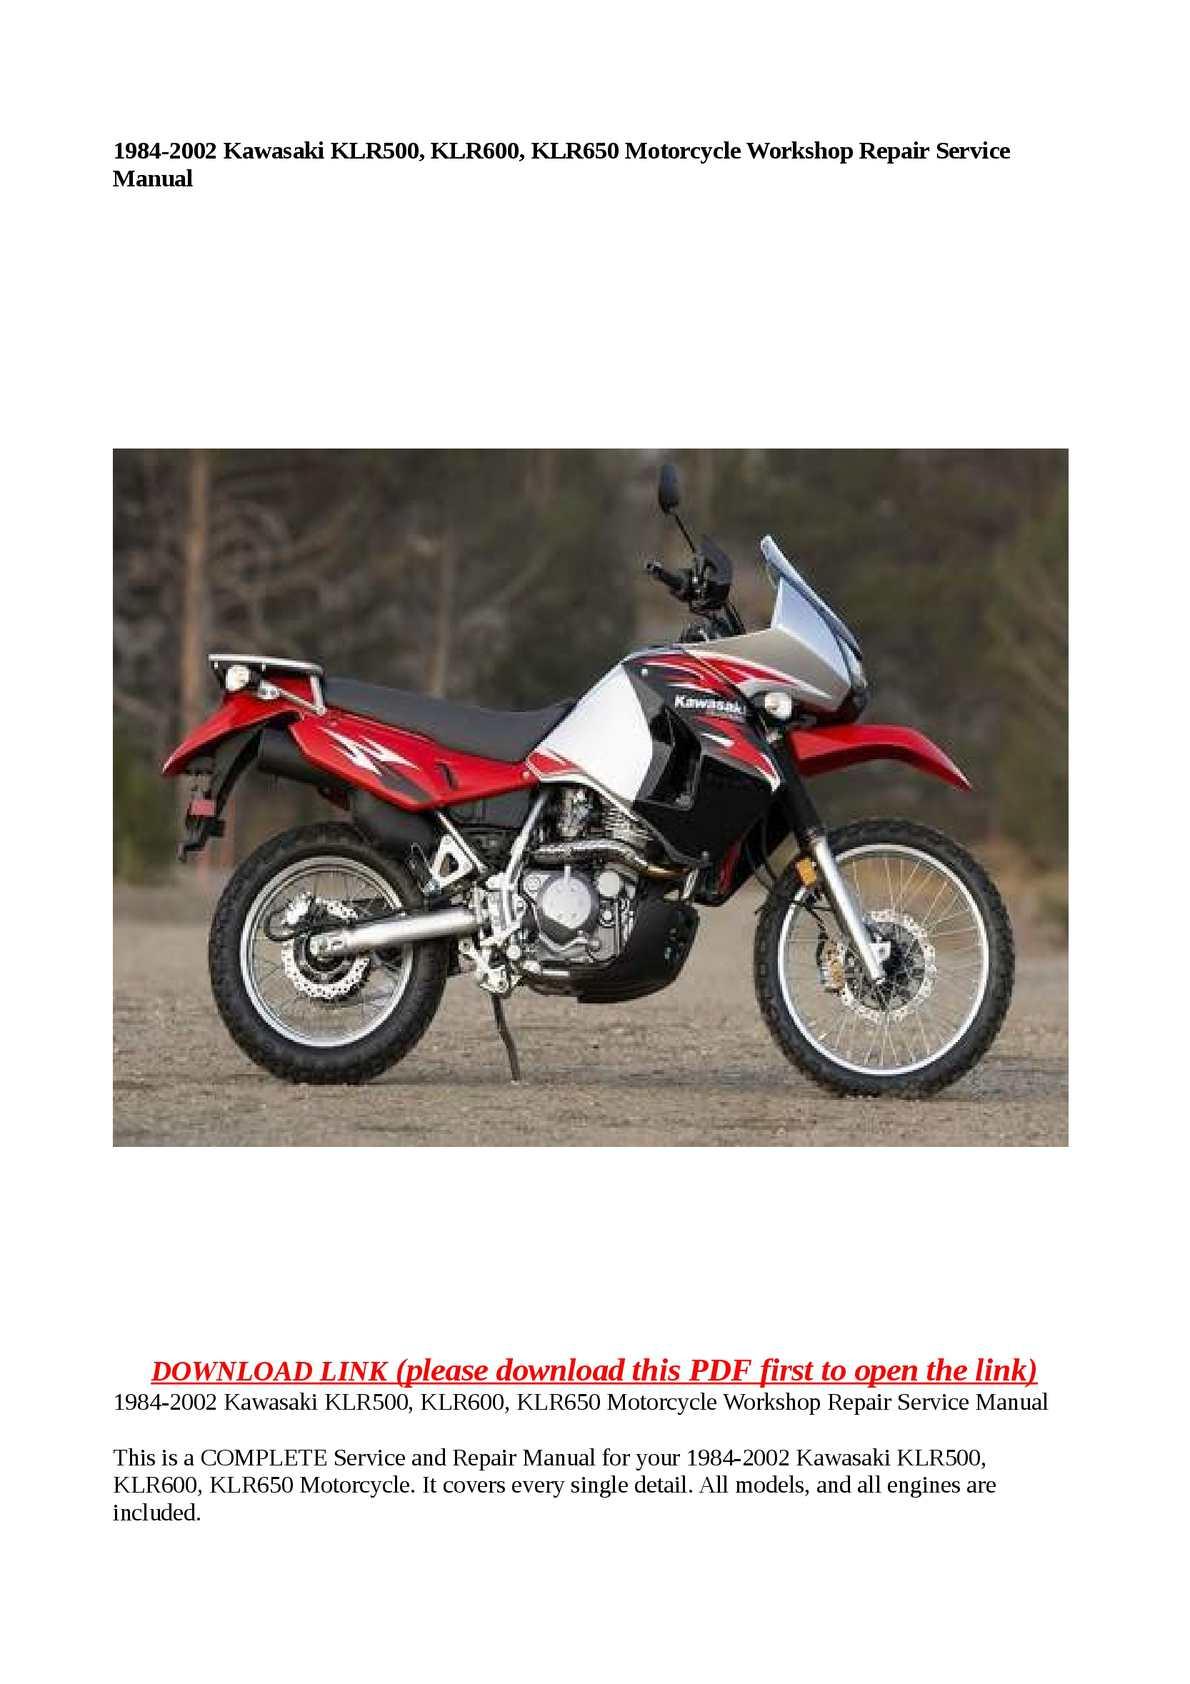 Calaméo - 1984-2002 Kawasaki KLR500, KLR600, KLR650 Motorcycle Workshop  Repair Service Manual